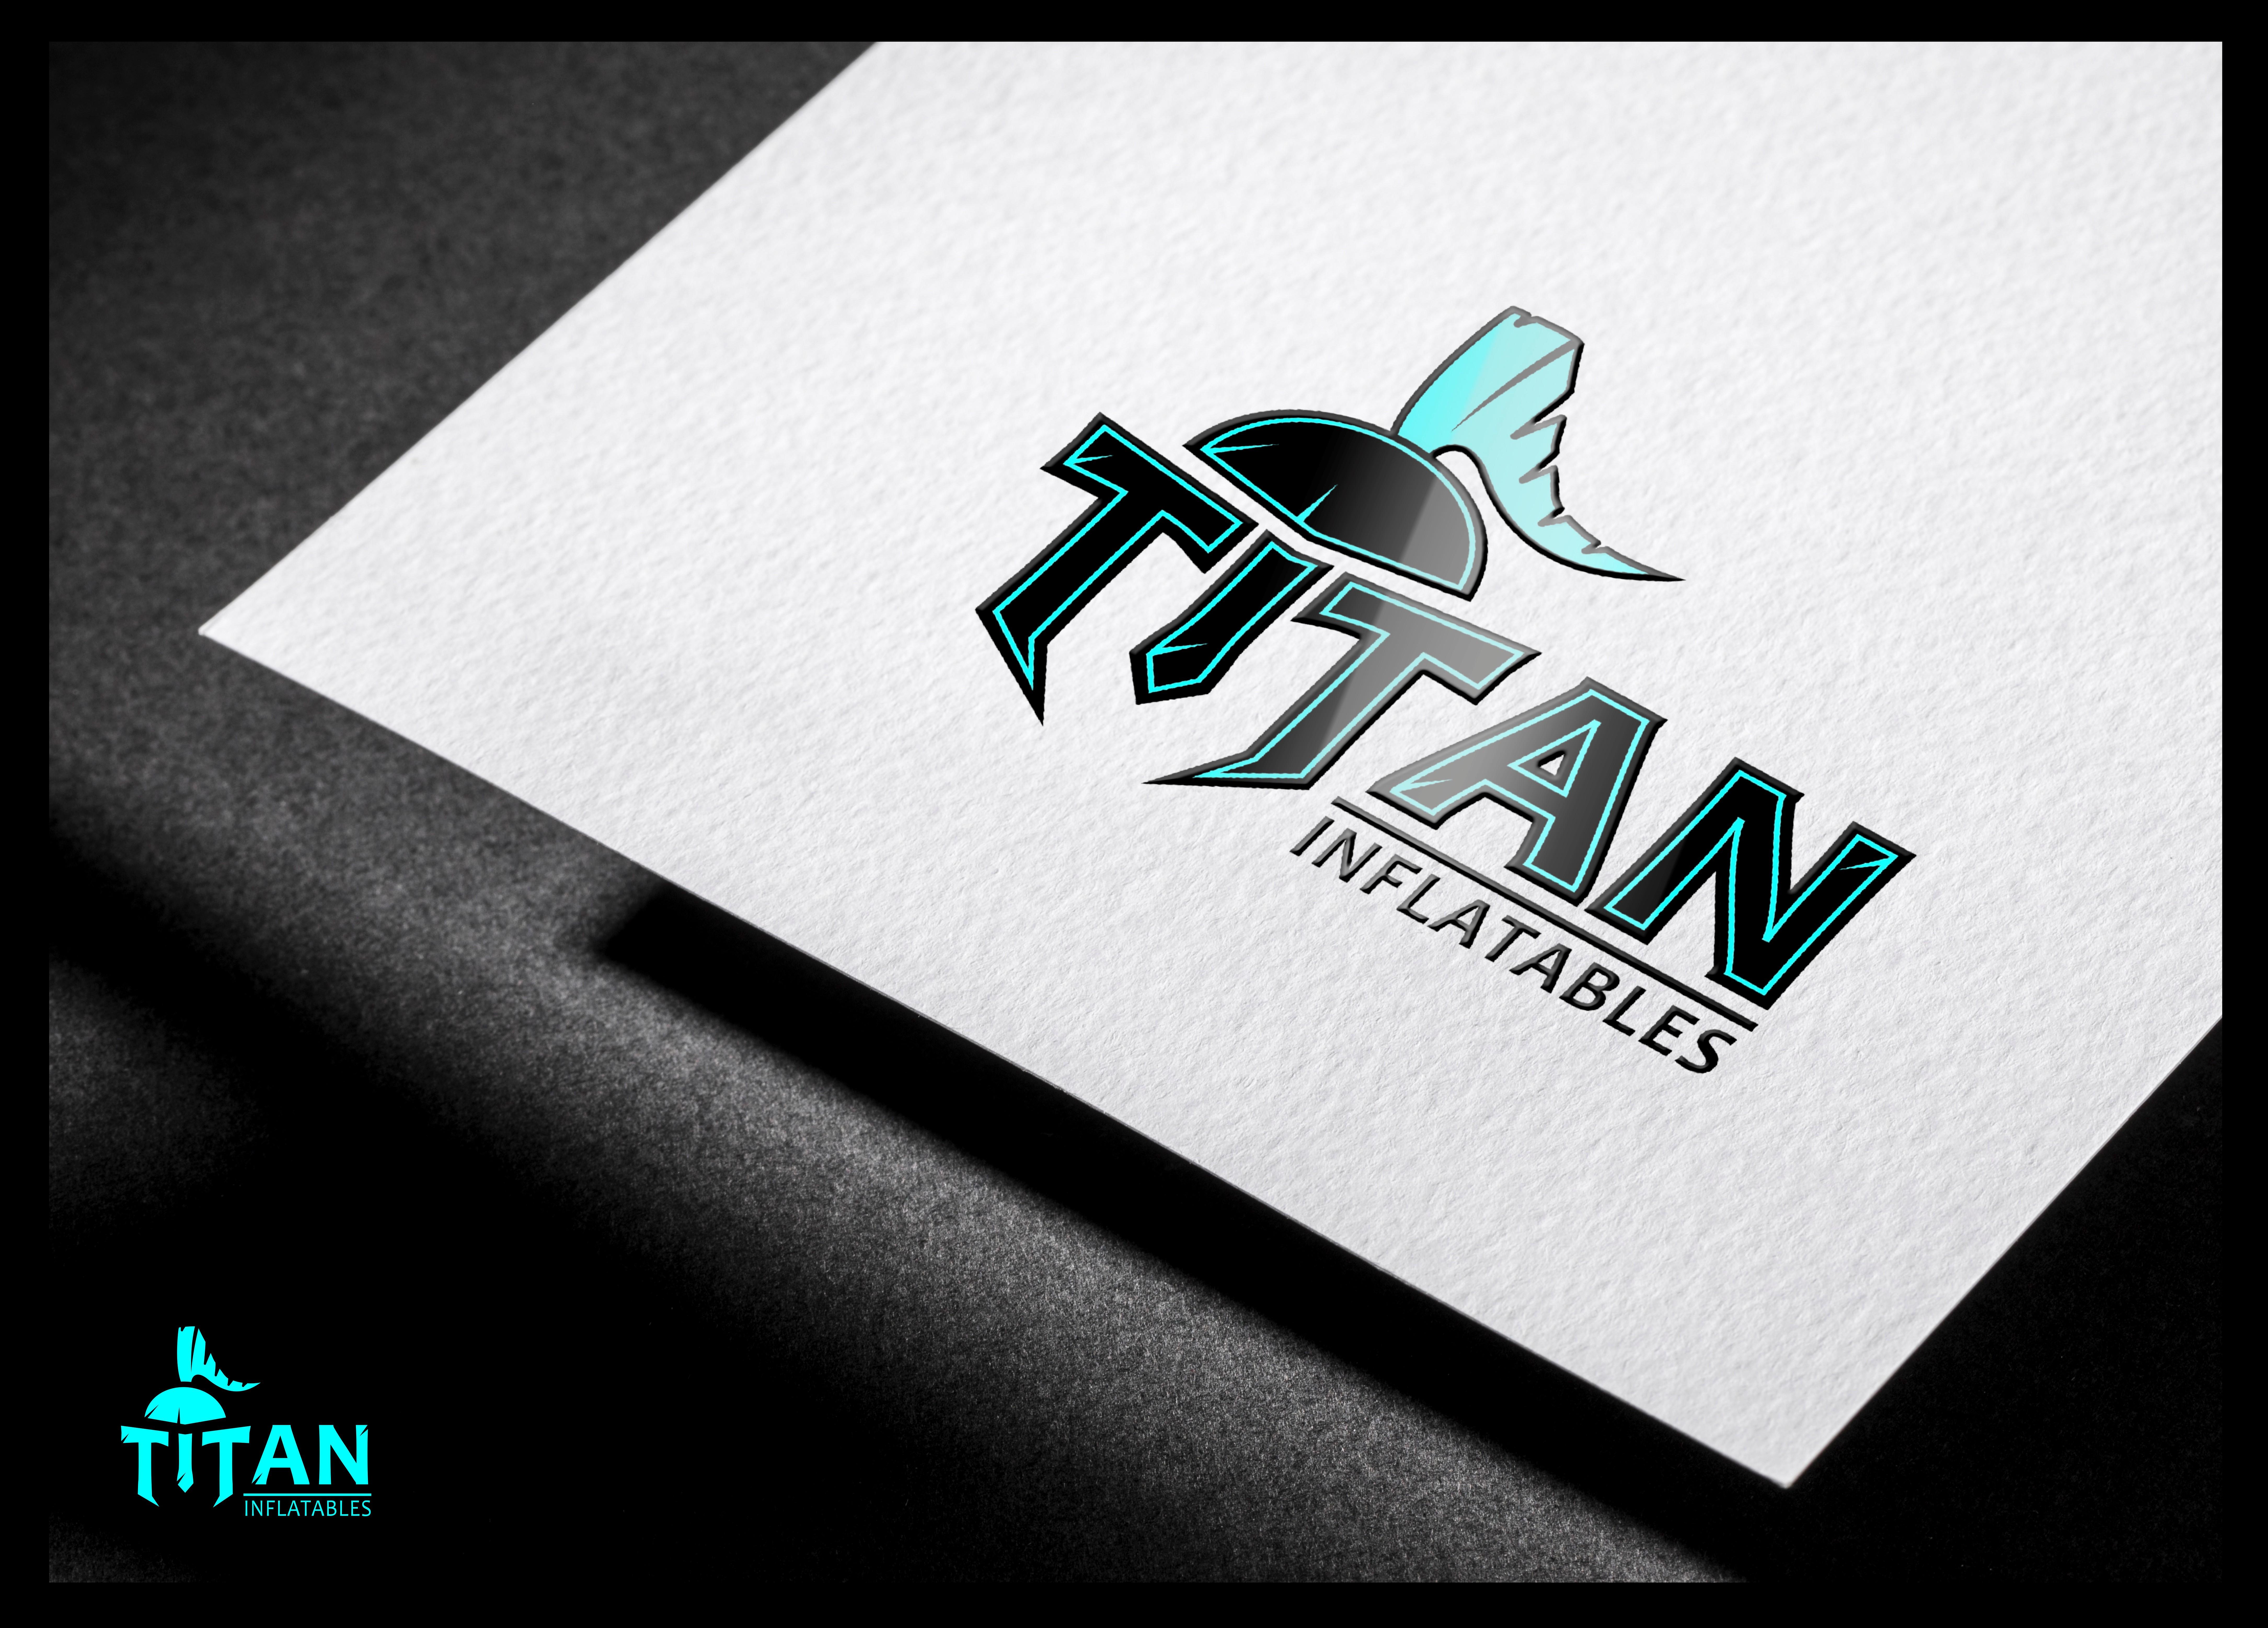 Titan Inflatable Manufacturing Company Logo